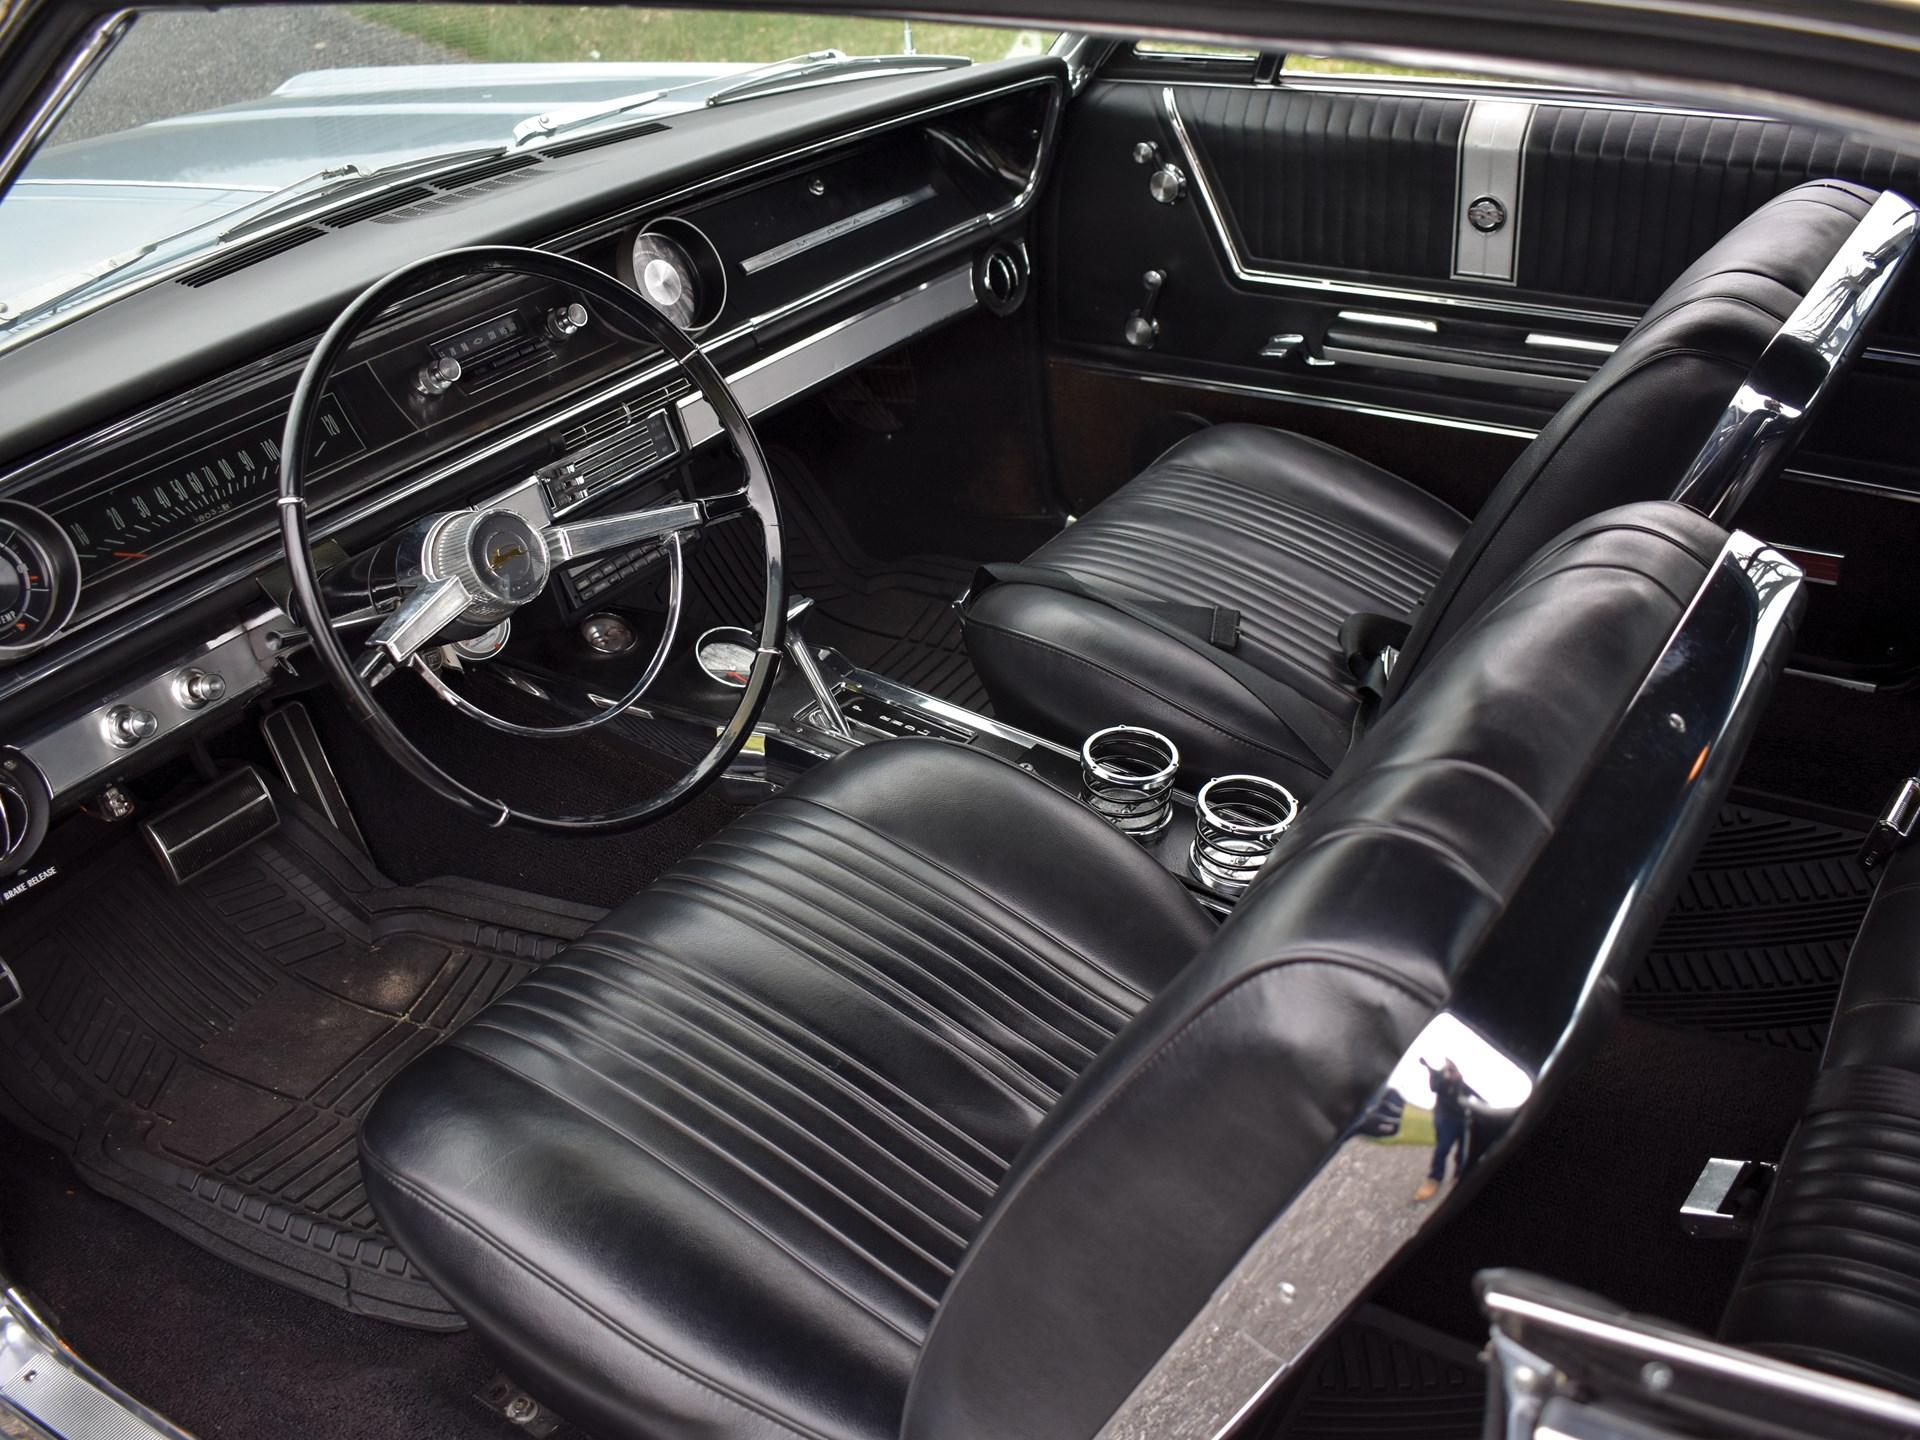 Rm Sotheby S 1965 Chevrolet Impala Ss Sport Coupe Auburn